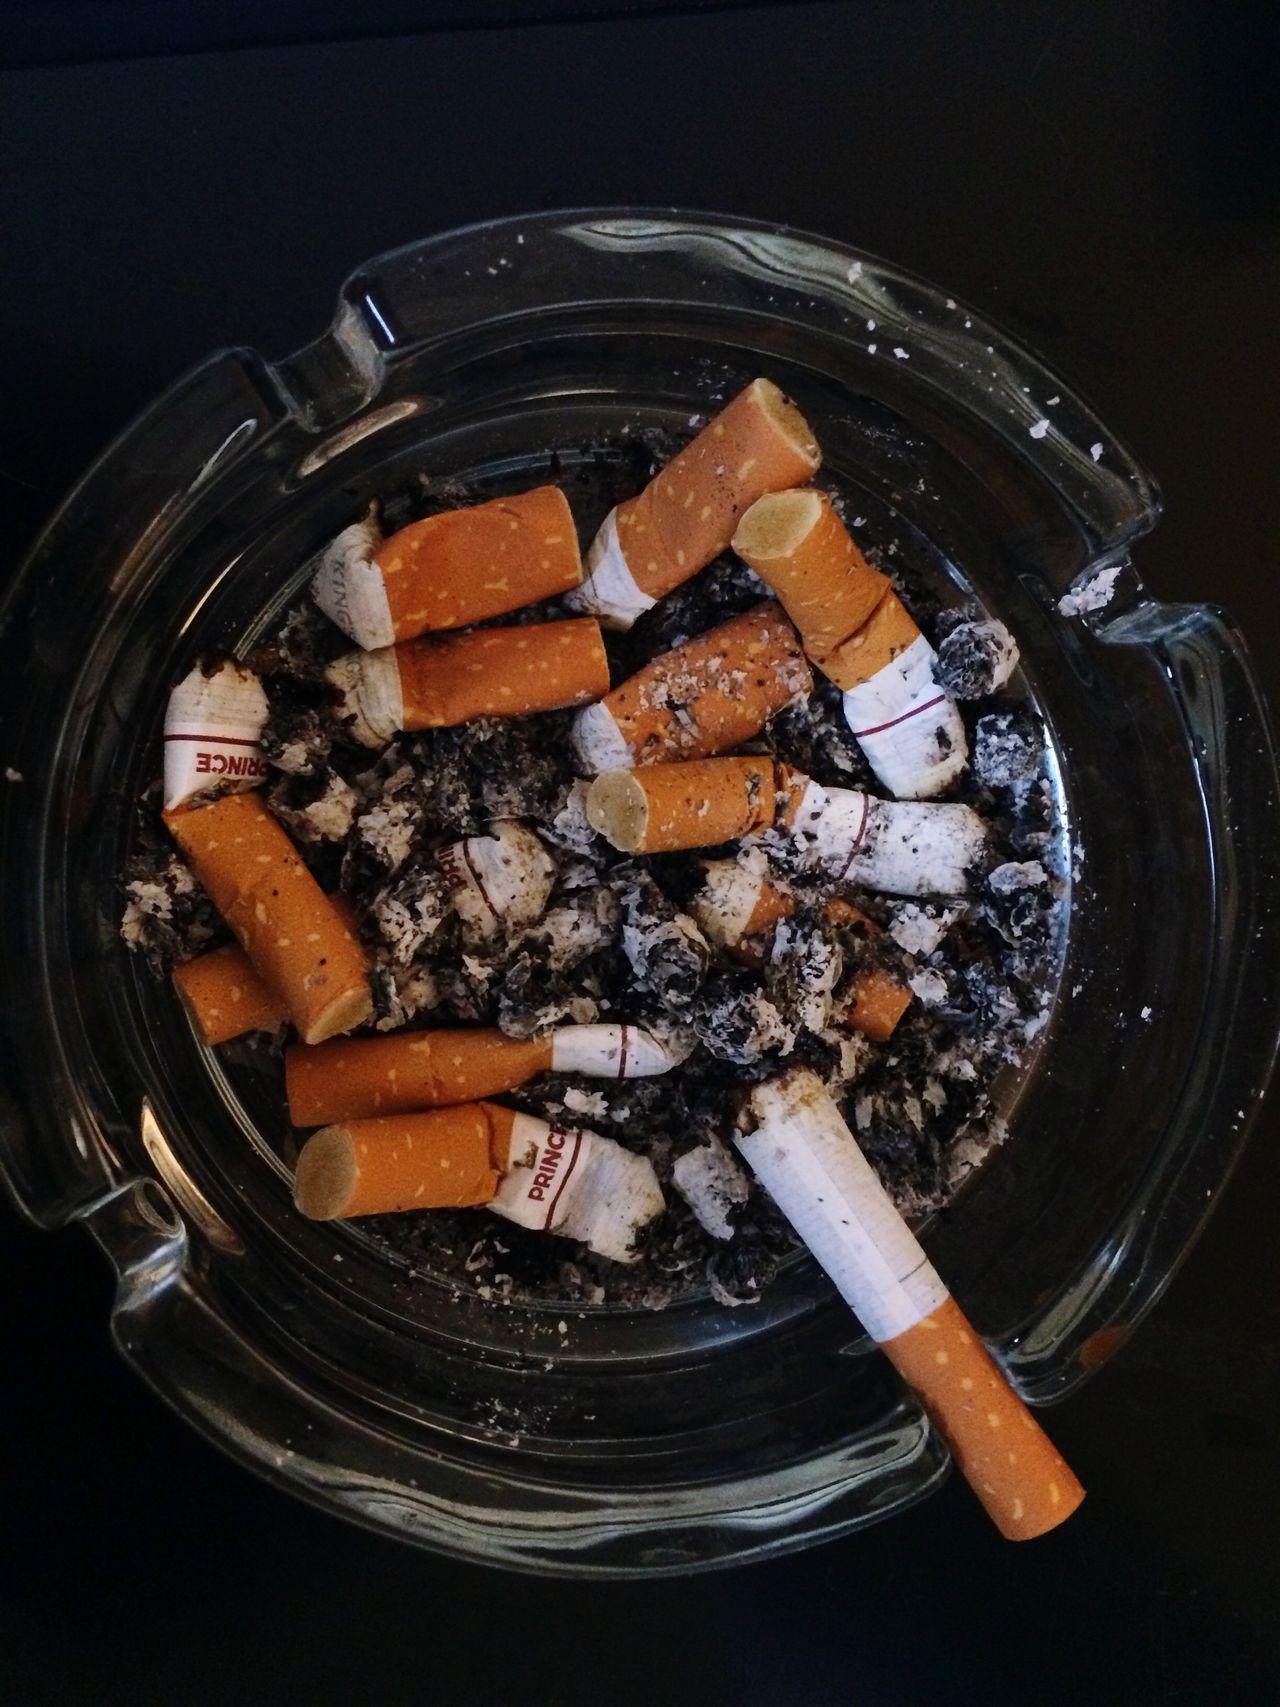 No People Close-up Indoors  Day Smoking Ashtray  Cigaretts